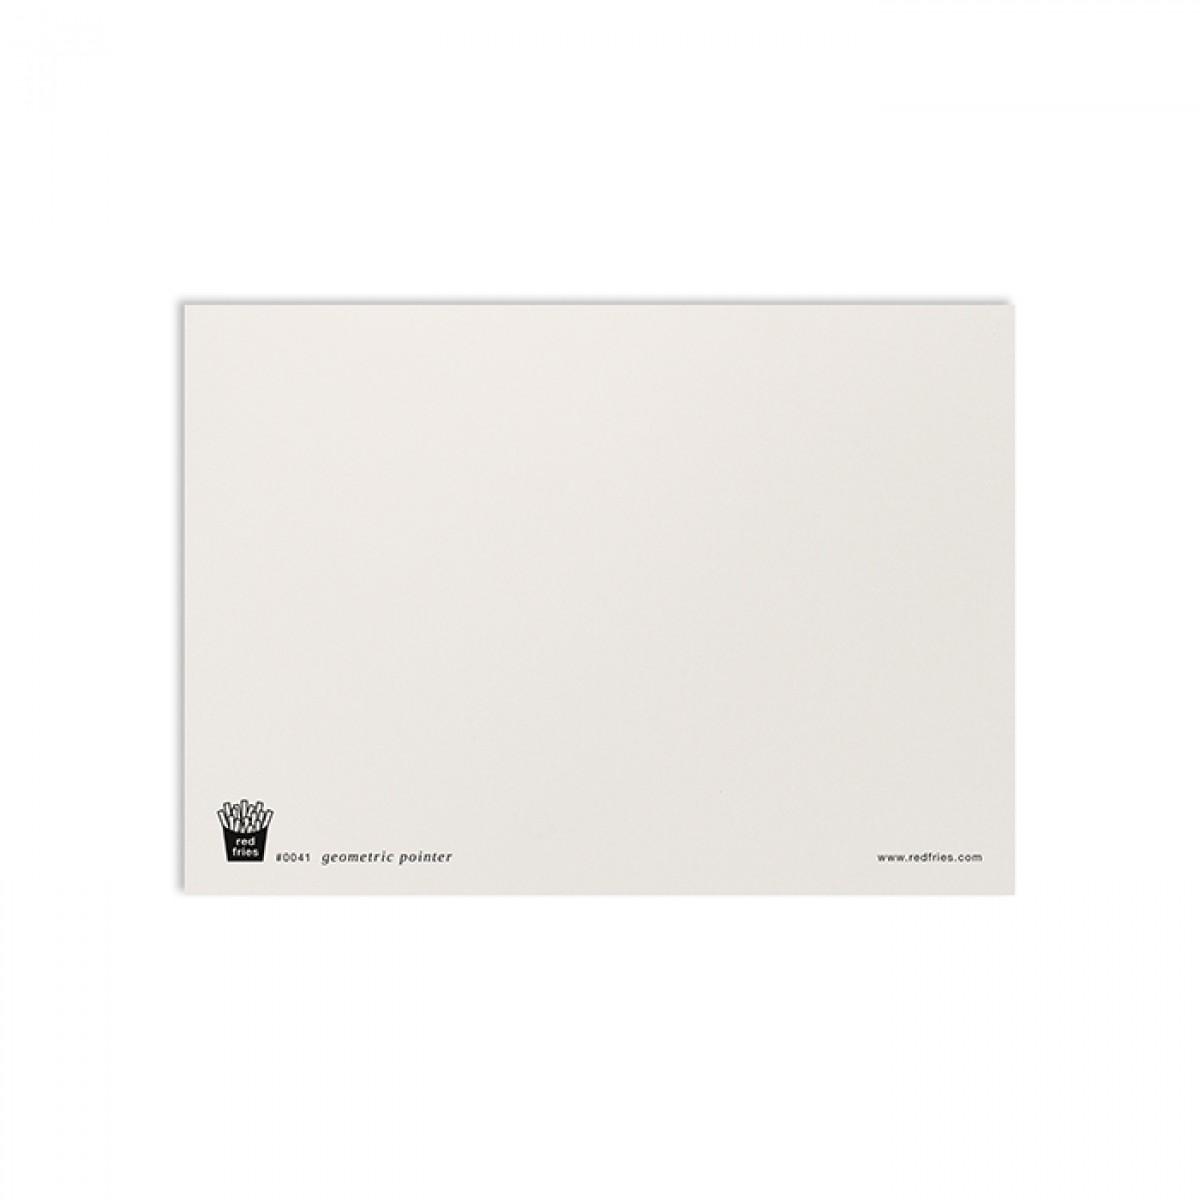 redfries geometric pointer – Postkarte DIN A6